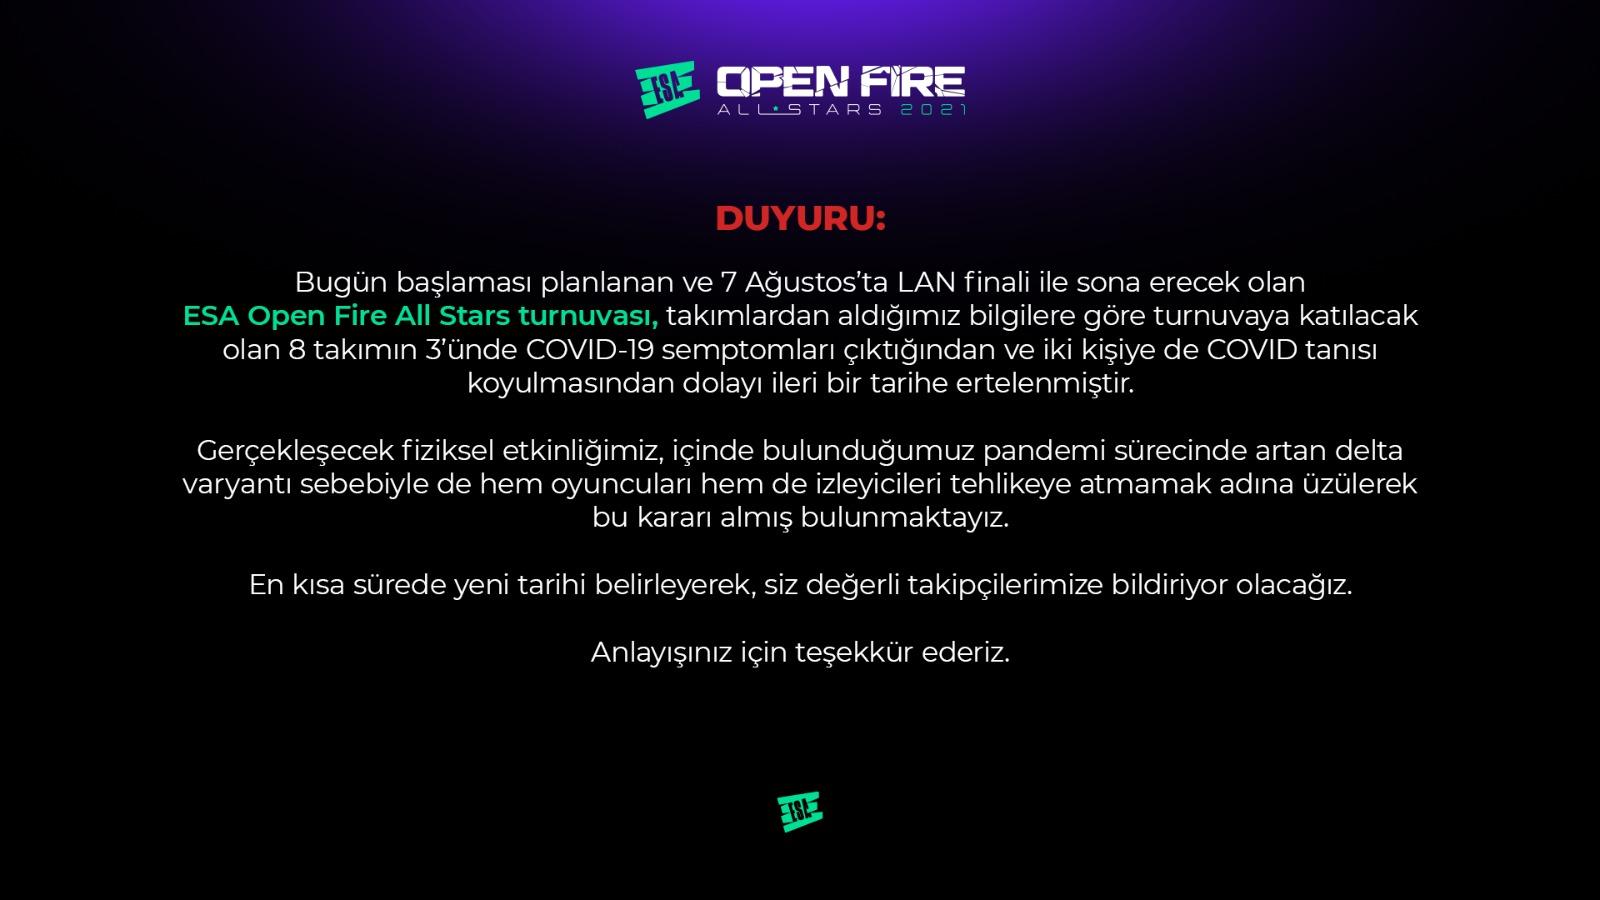 ESA Open Fire All Stars